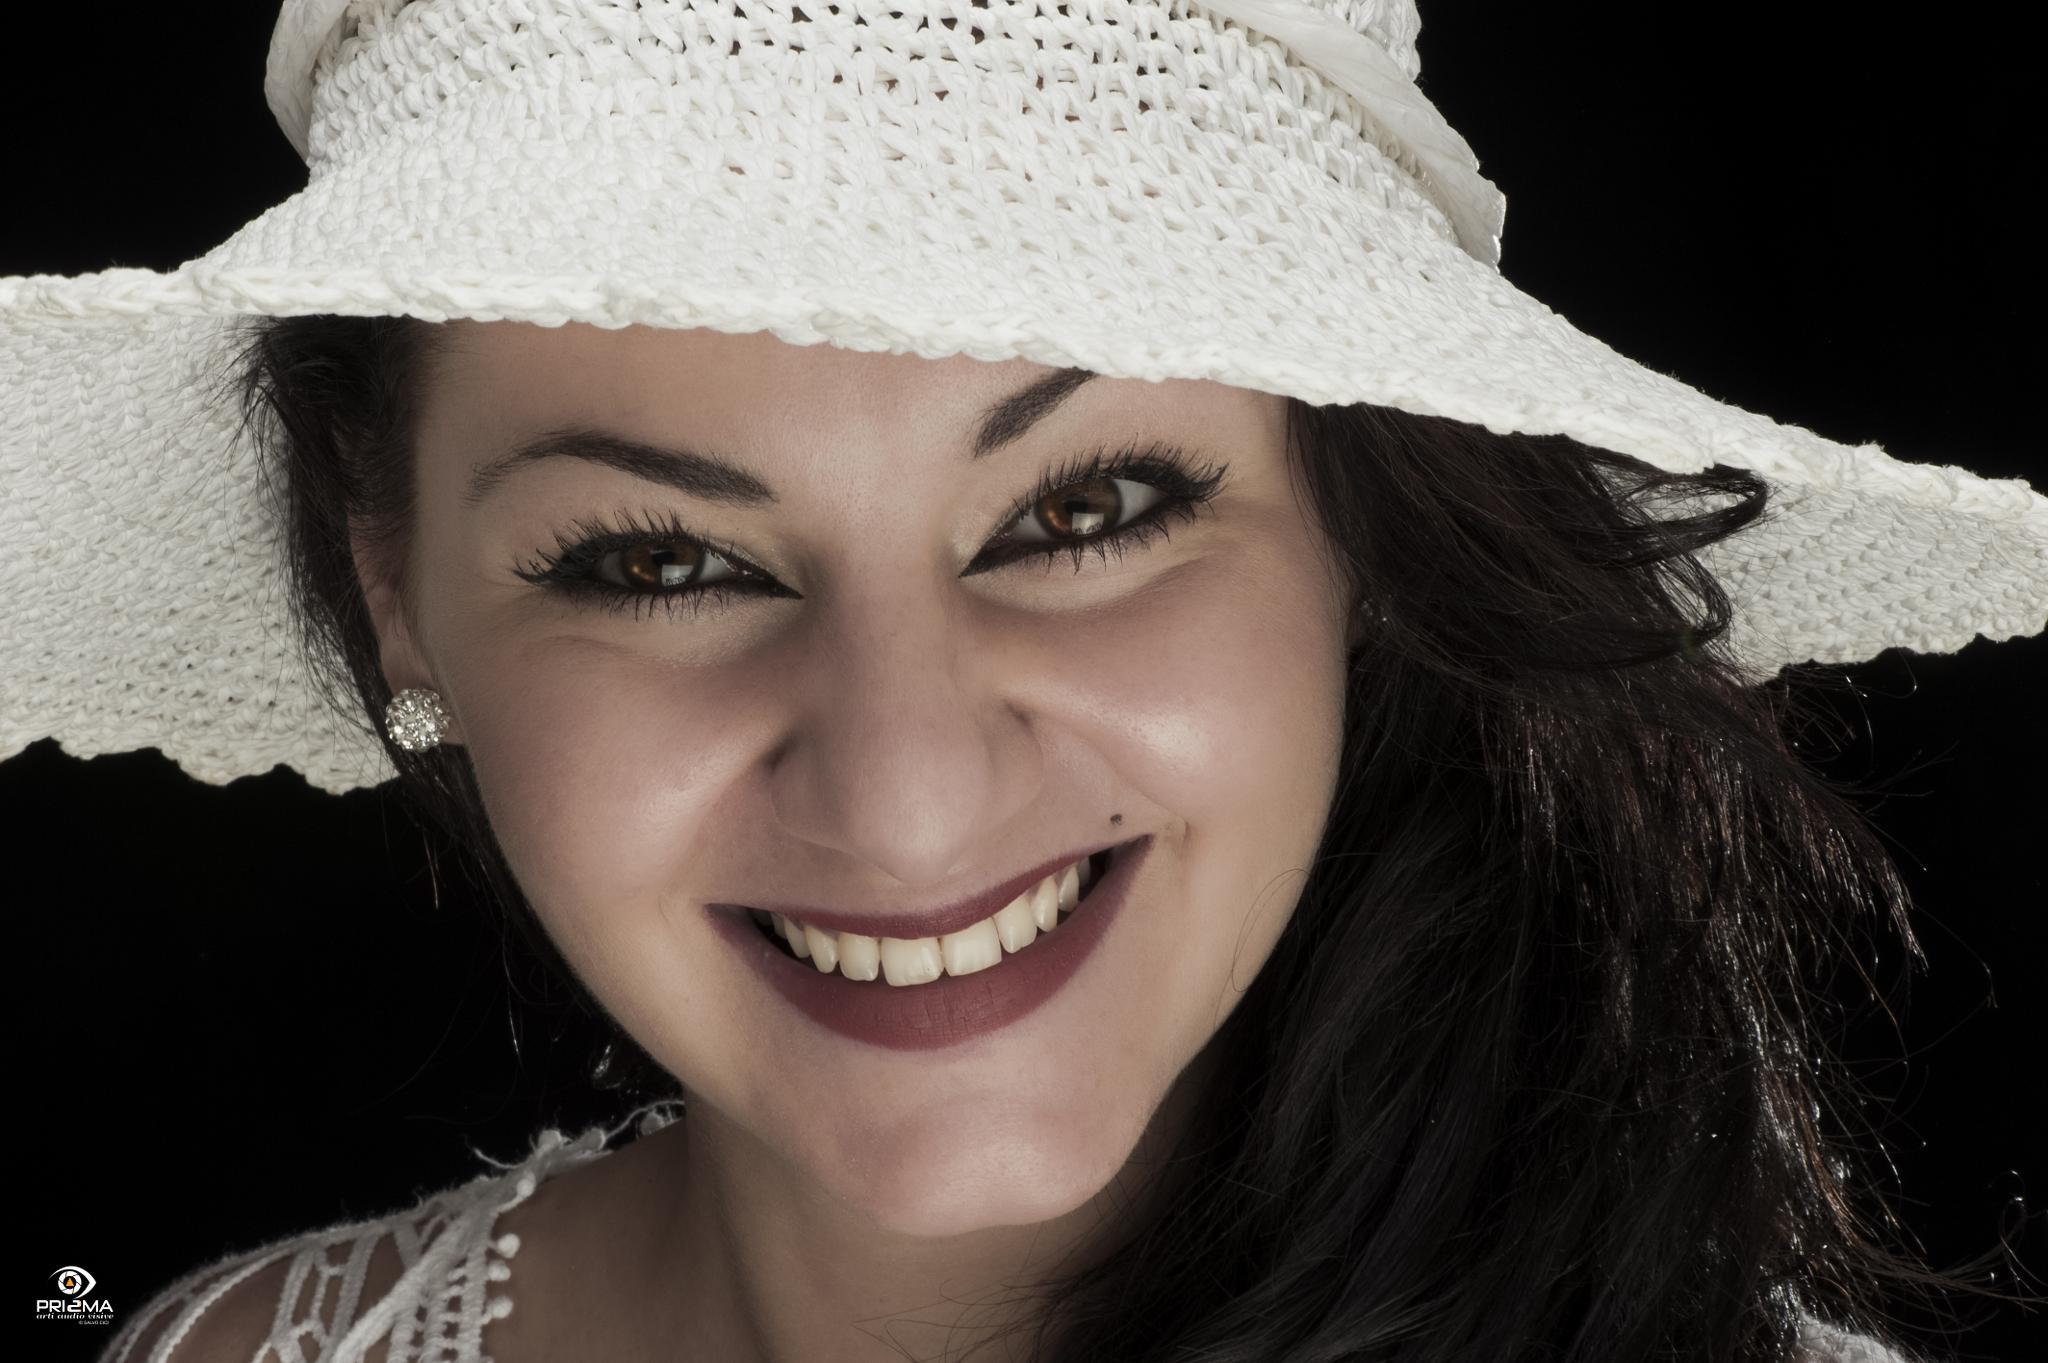 Smile by salvo.cici